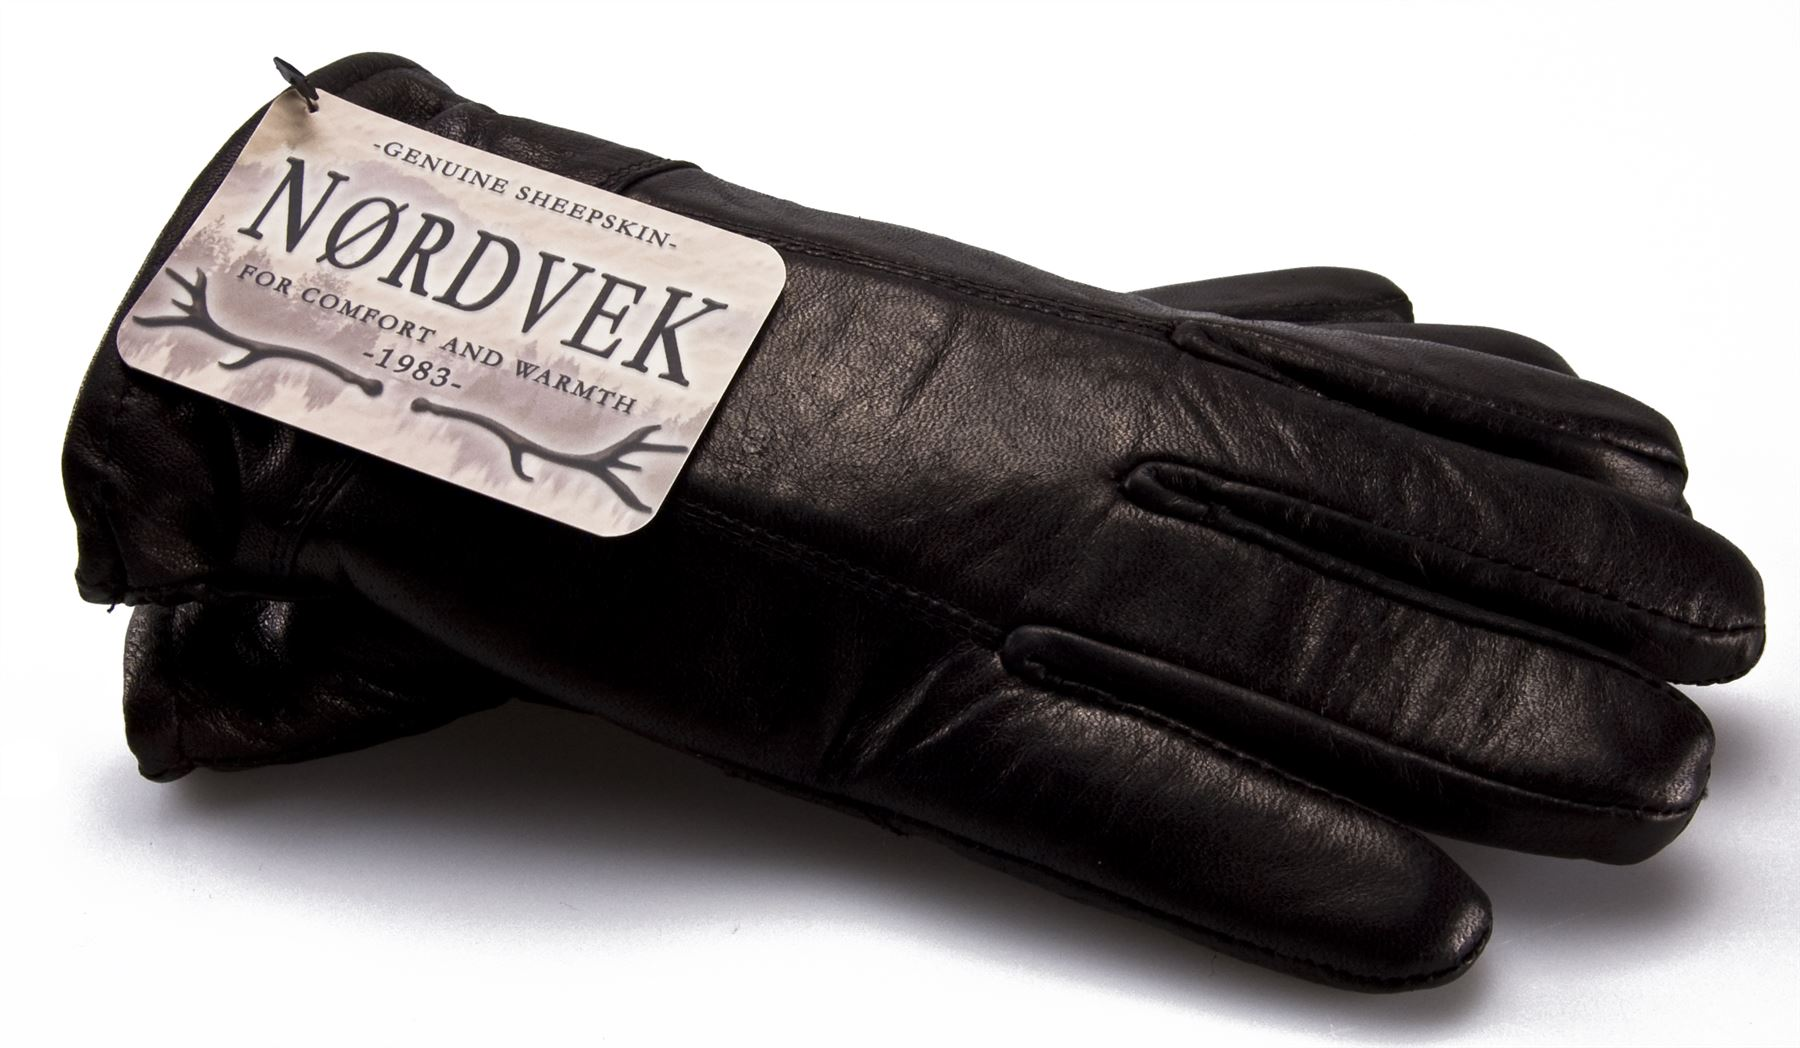 Mens sheepskin gloves uk - Picture 6 Of 12